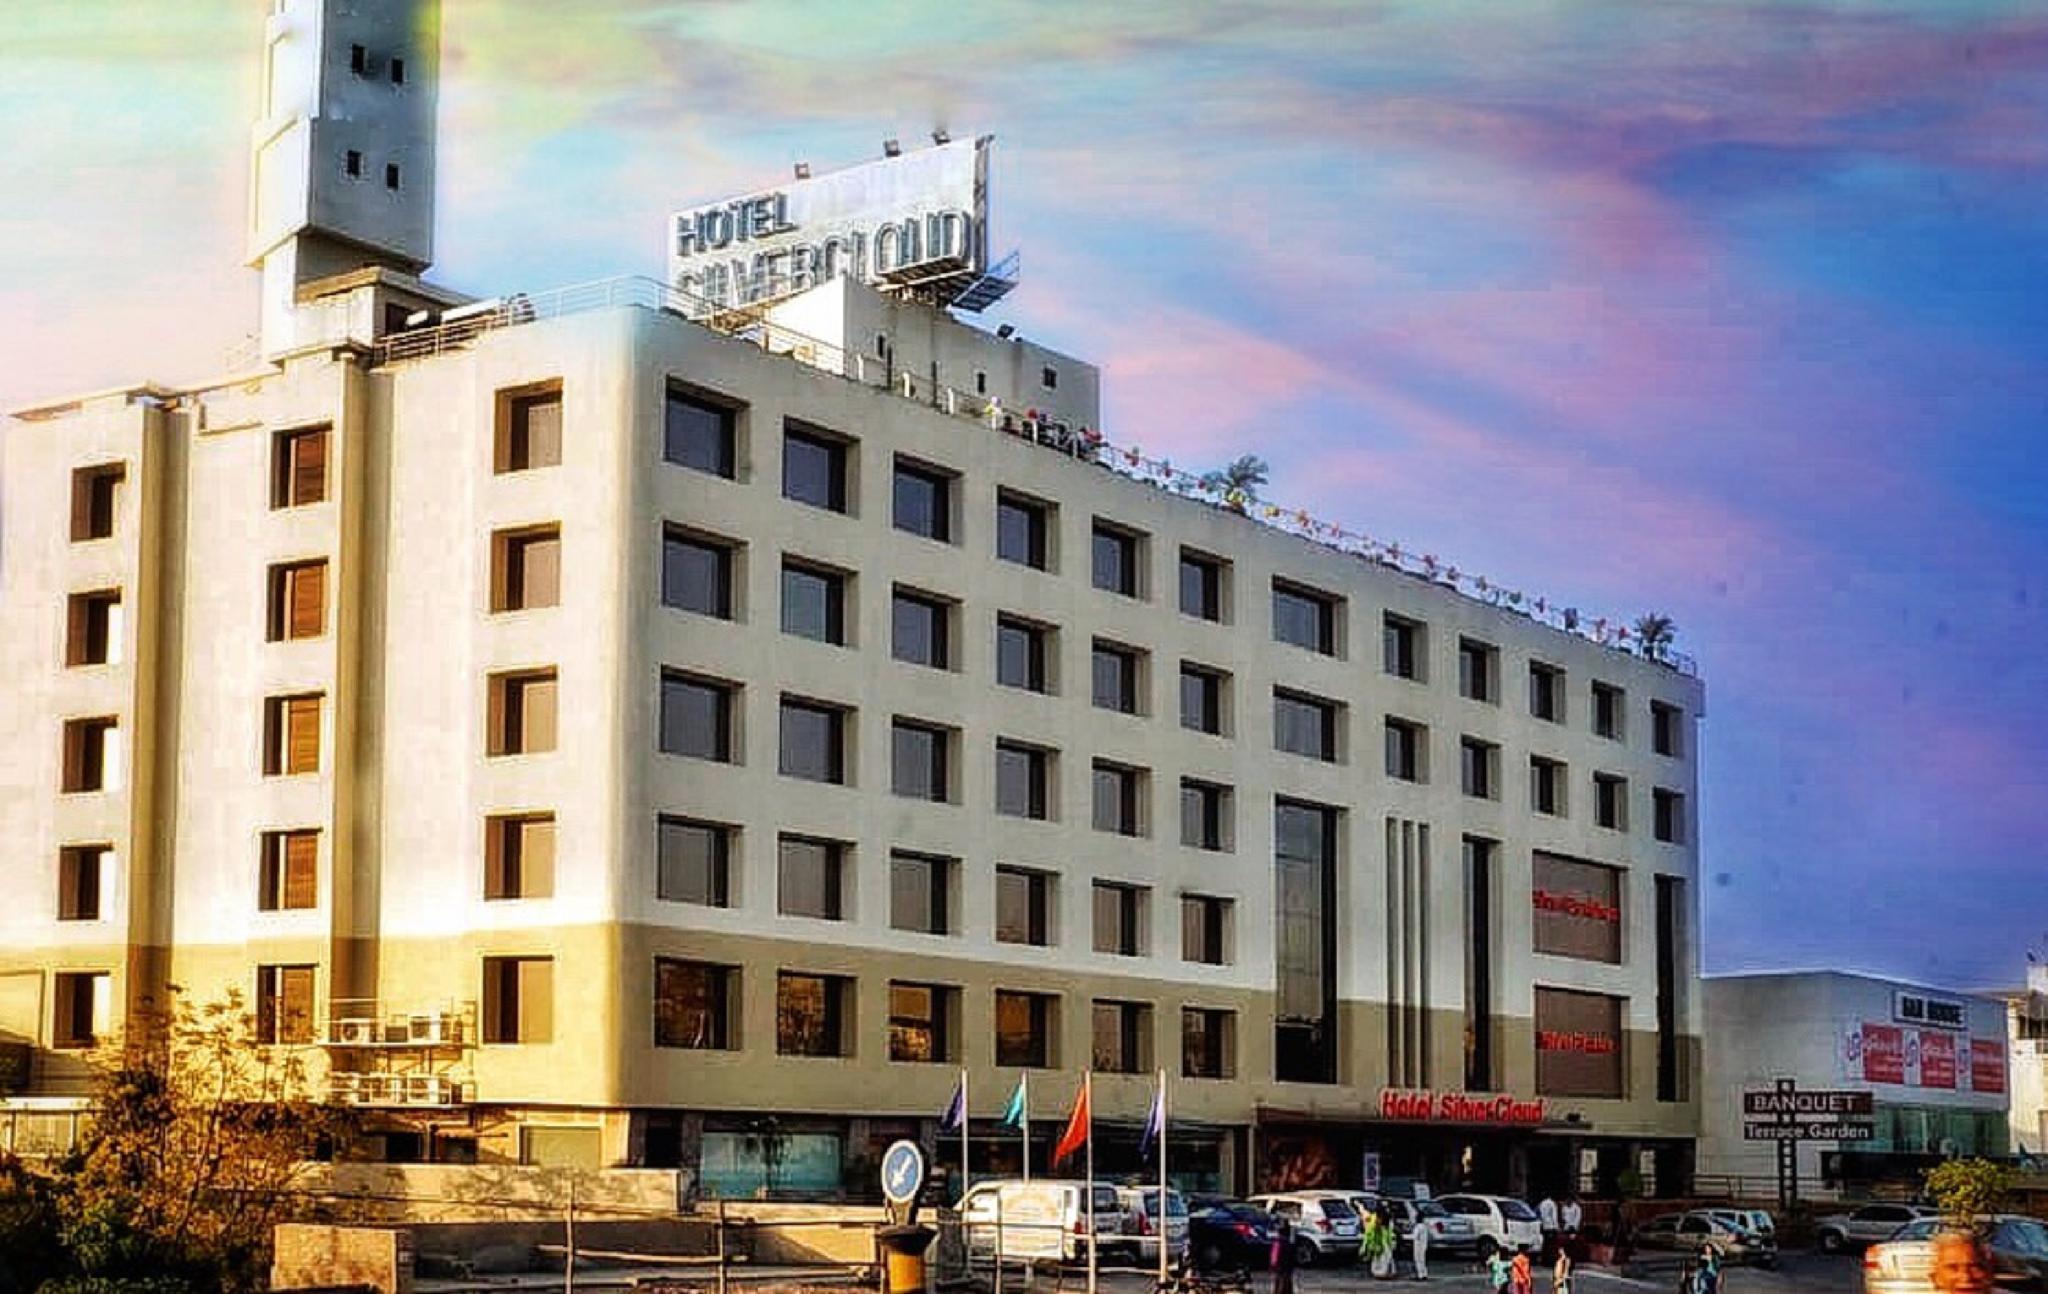 Hotel Silver Cloud